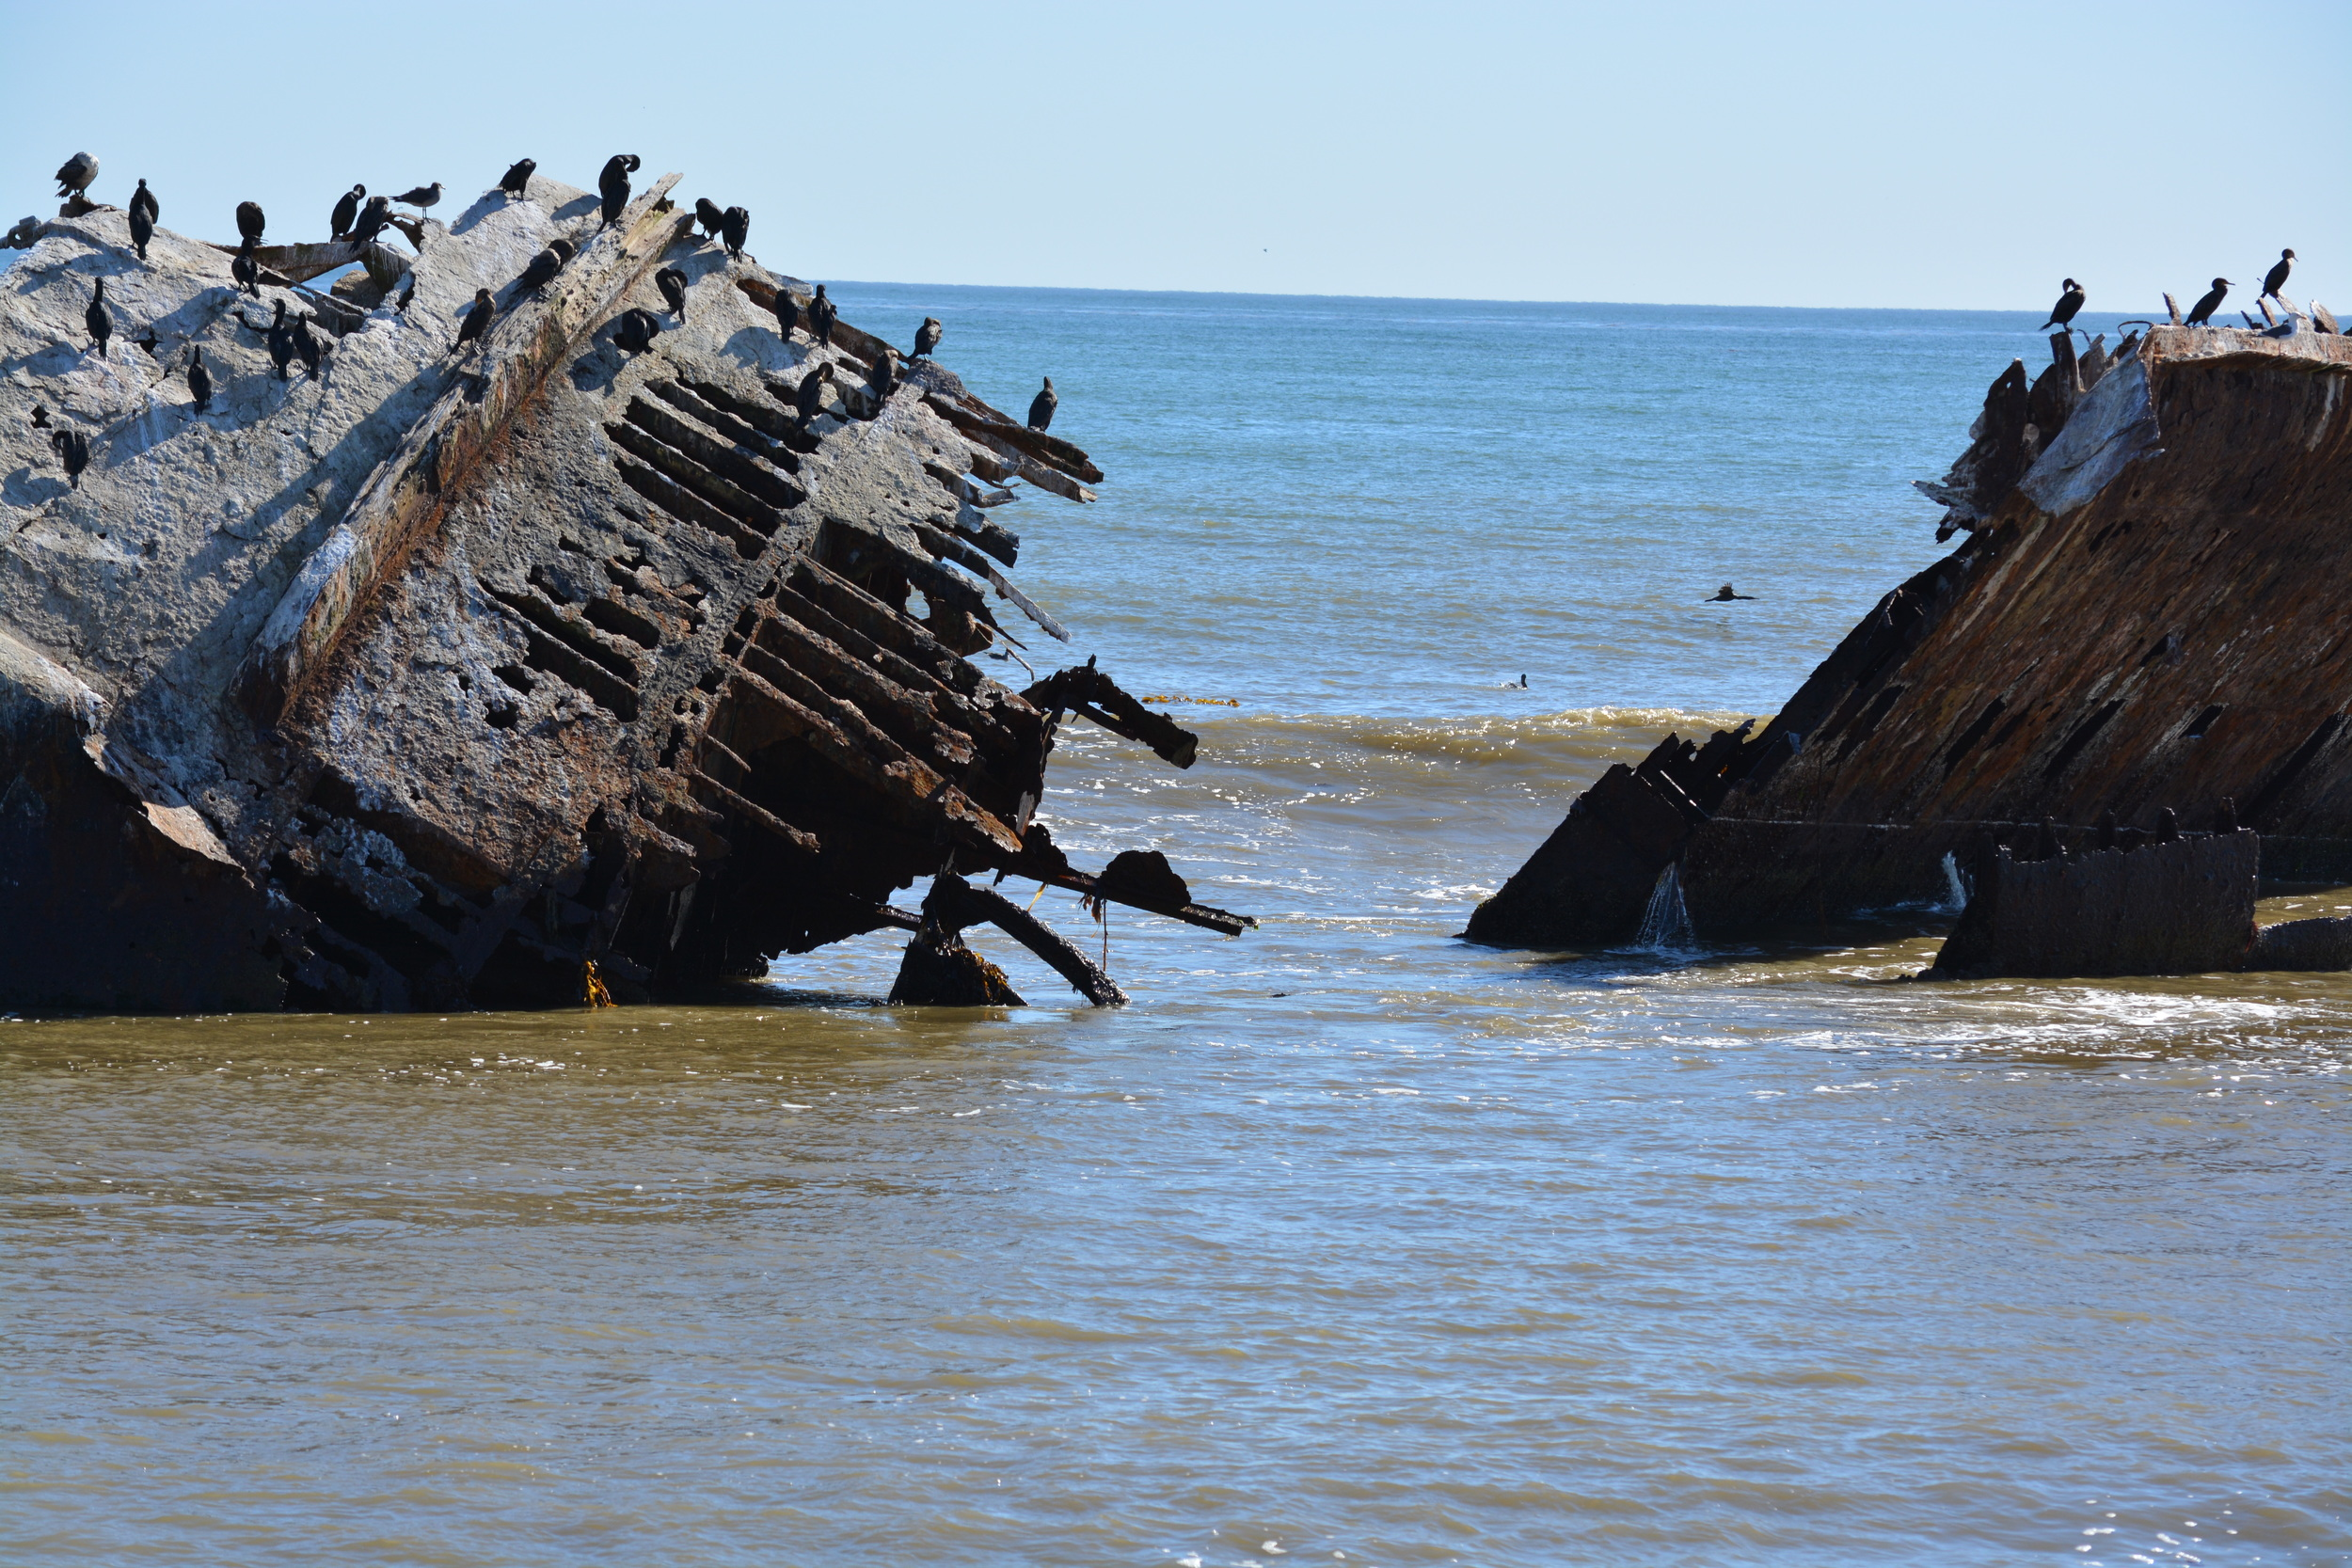 Baja California 10-5-13 Shipwrecks Surfing Adventure Ocean Experience Surf School San Diego (72).JPG